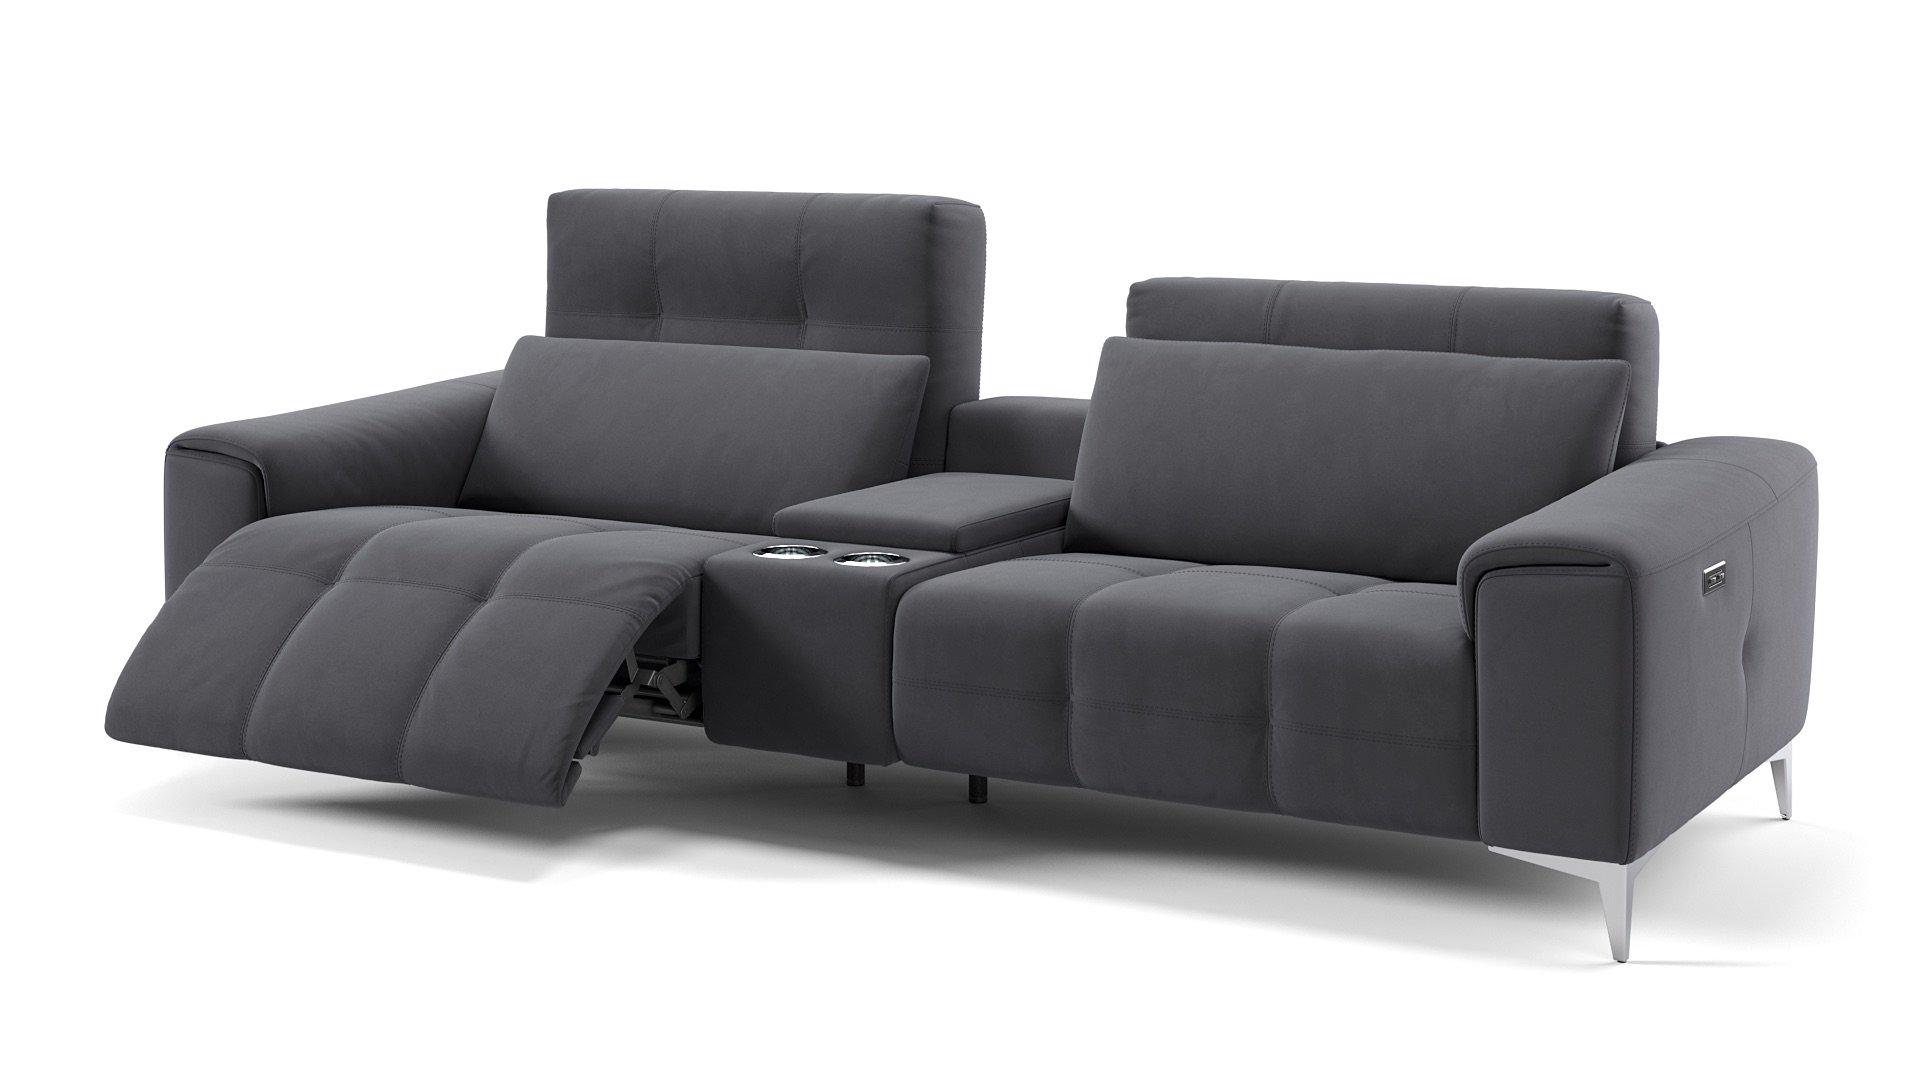 Stoff 2-Sitzer Kinosofa SALENTO